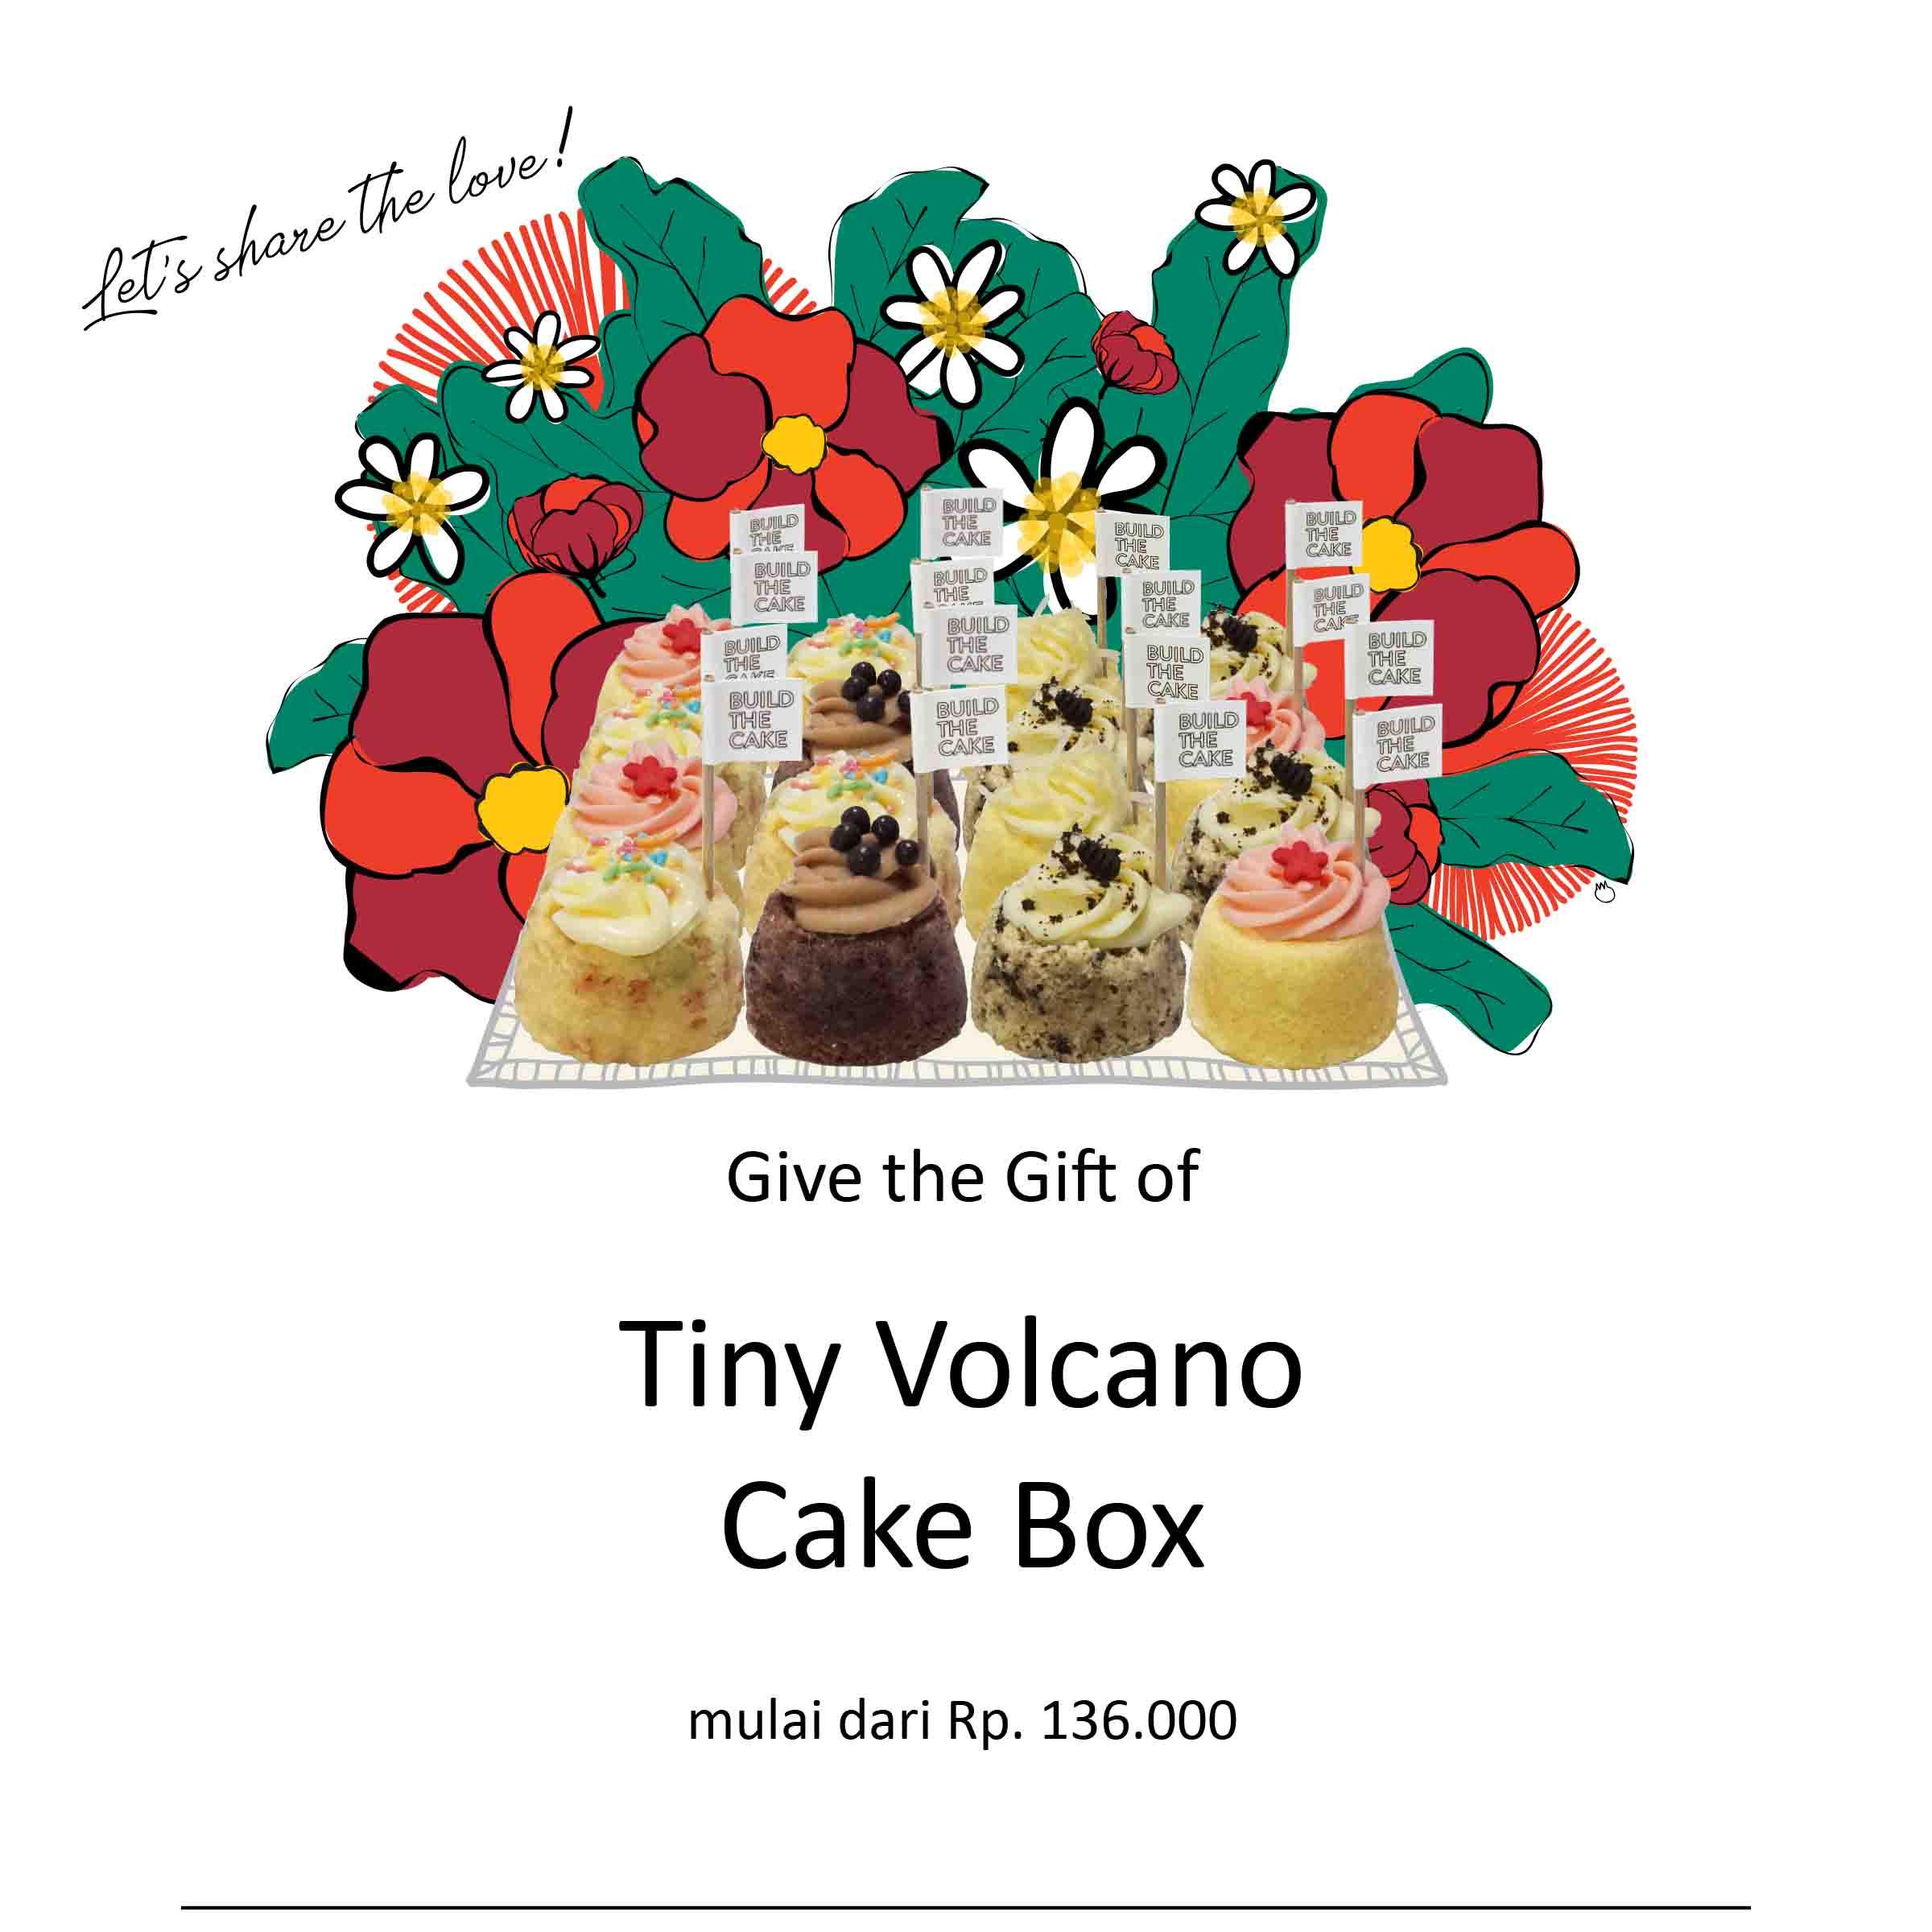 Tiny Volcano Cake